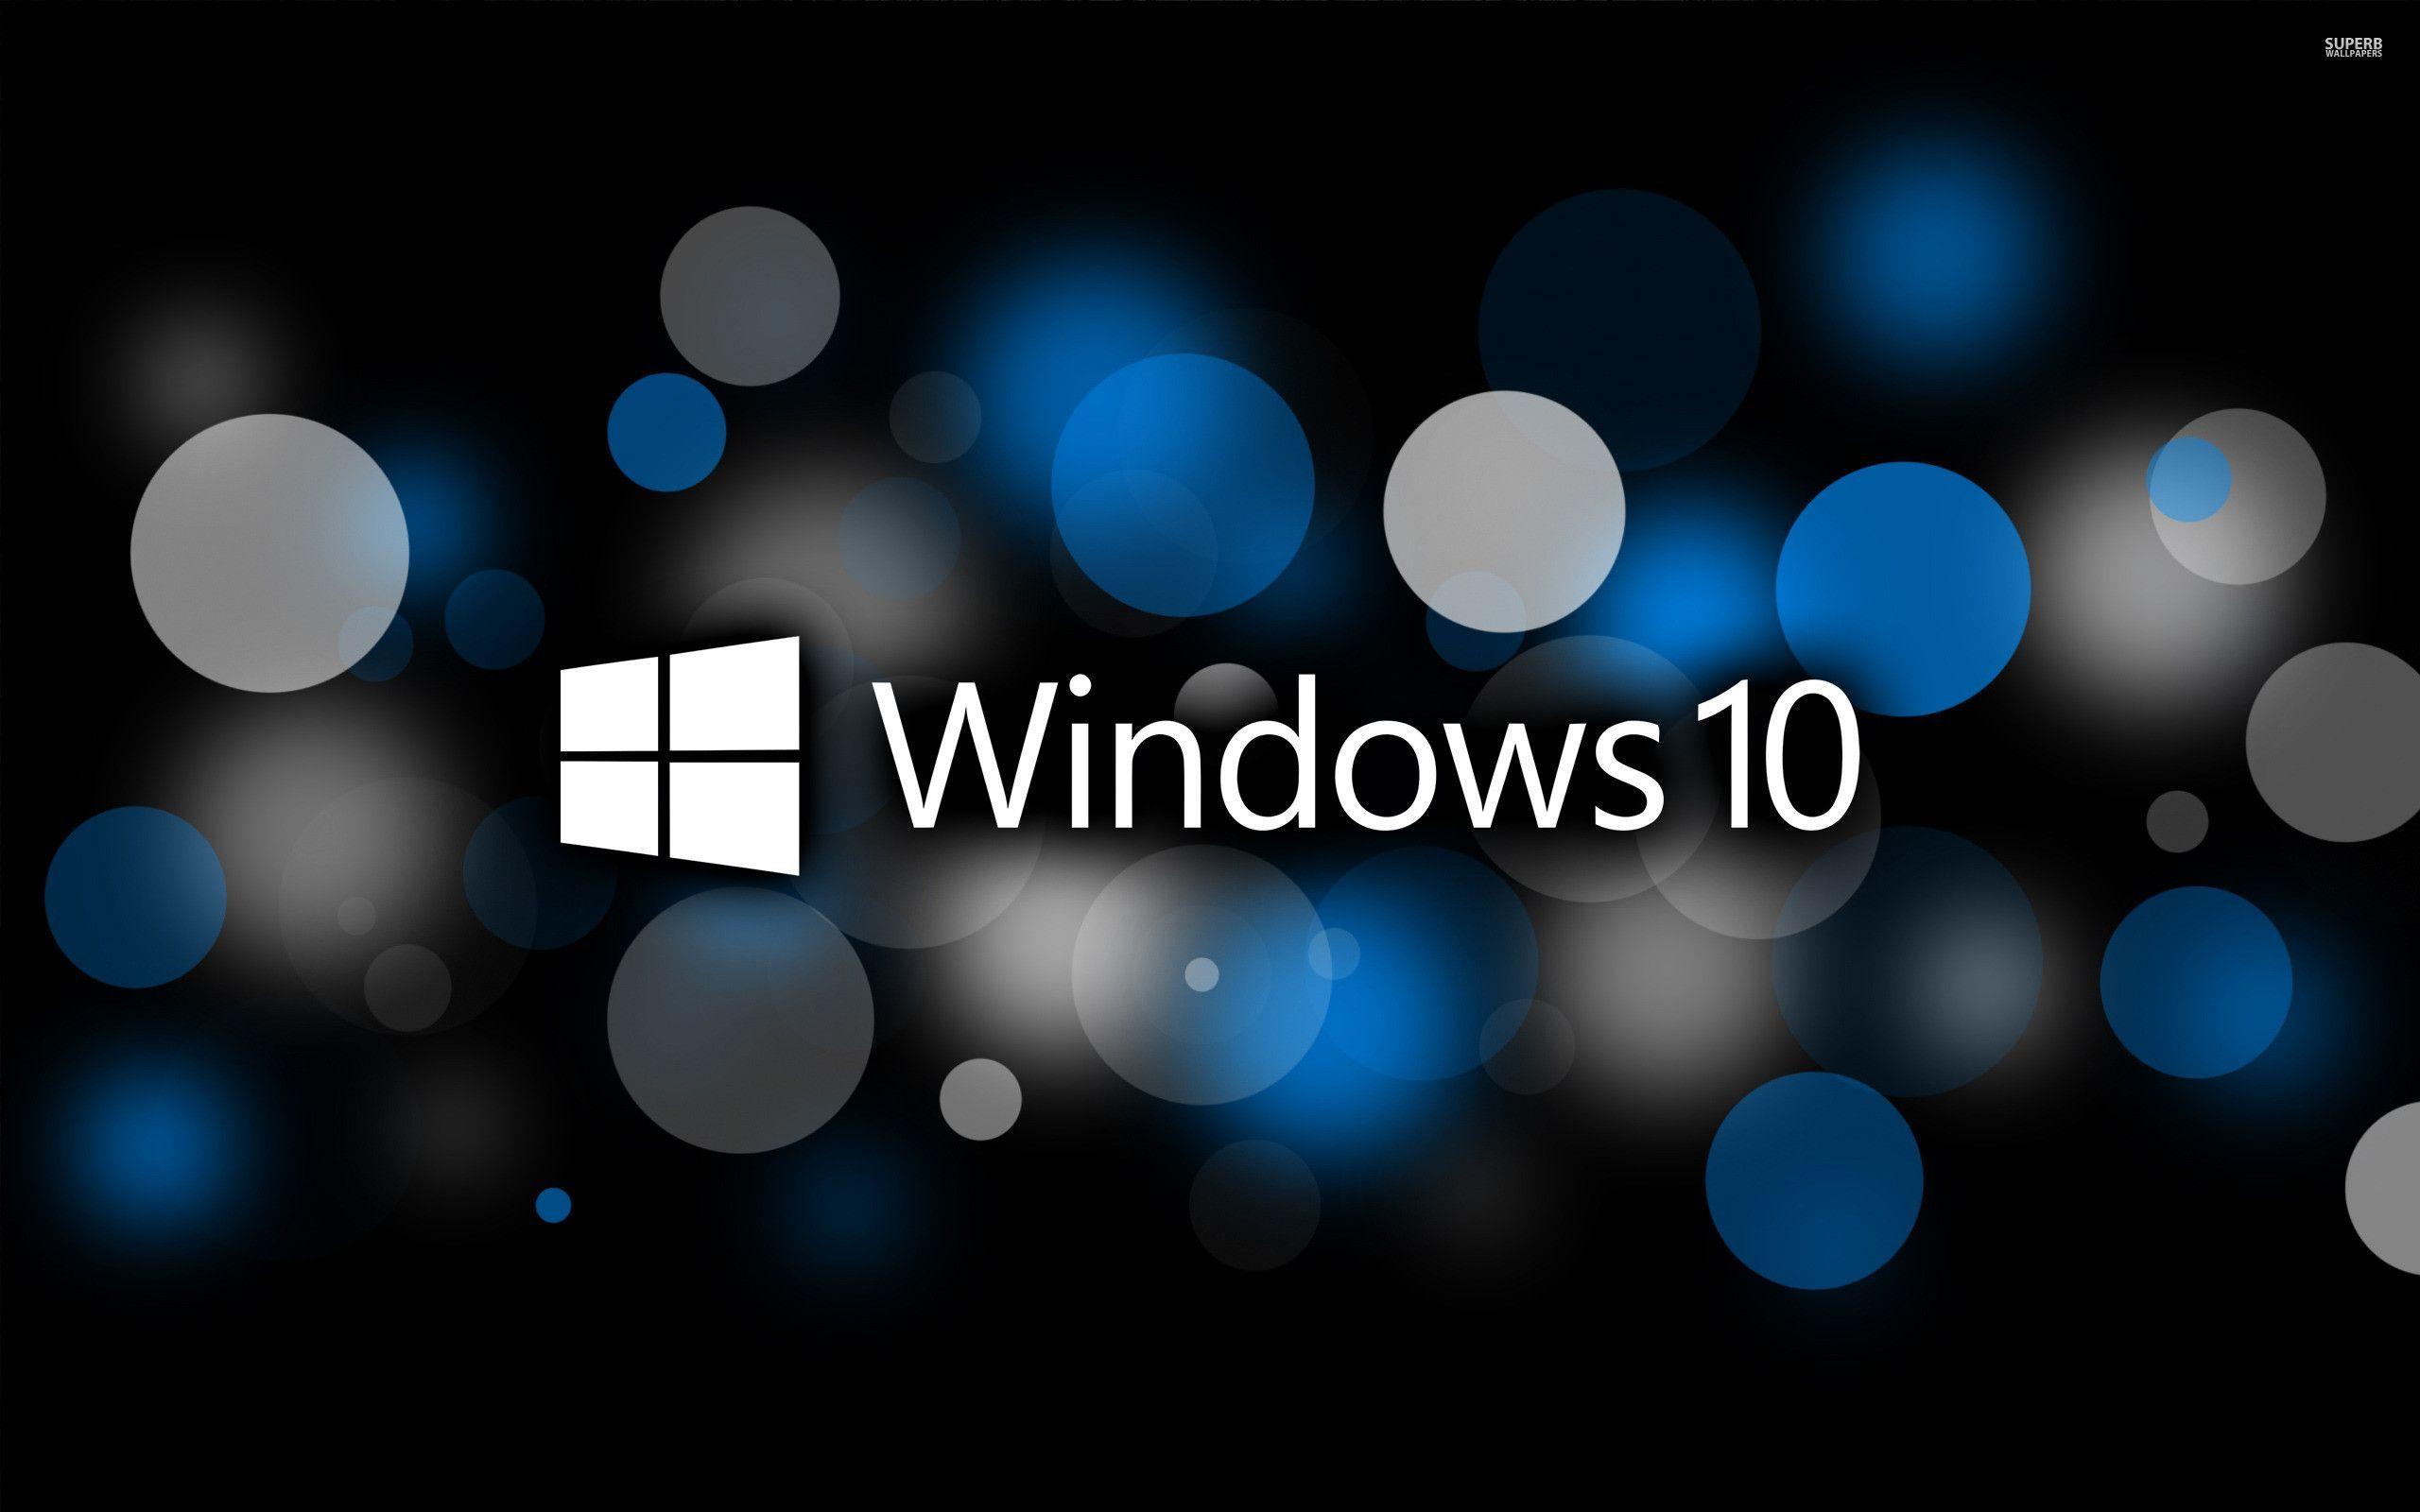 25601600 Windows 10 Wallpaper Hd 1080p 5337 Wallpaper Download Hd Wallpaper 4k Tapeten